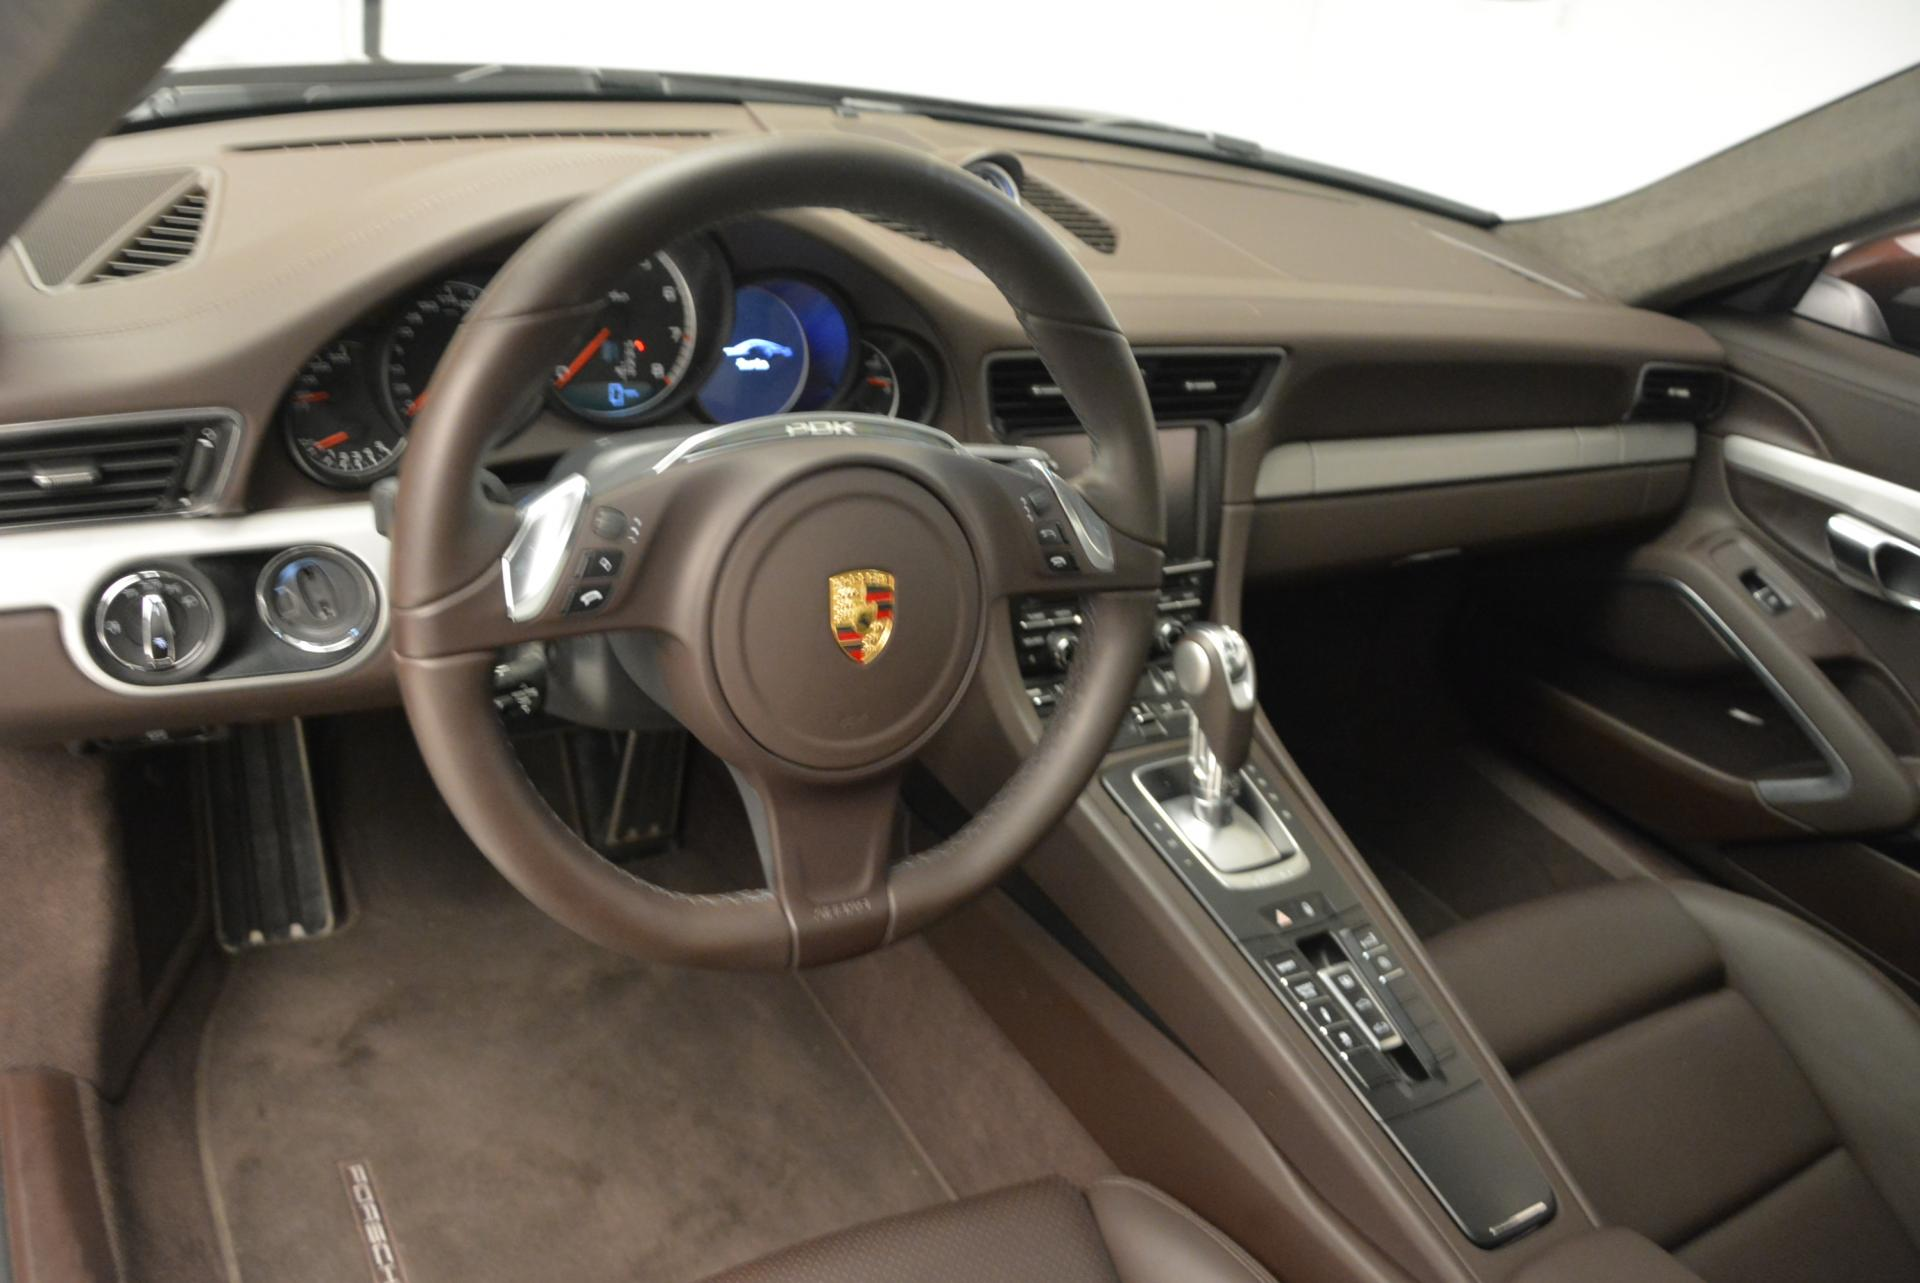 Used 2014 Porsche 911 Turbo For Sale In Greenwich, CT 111_p19